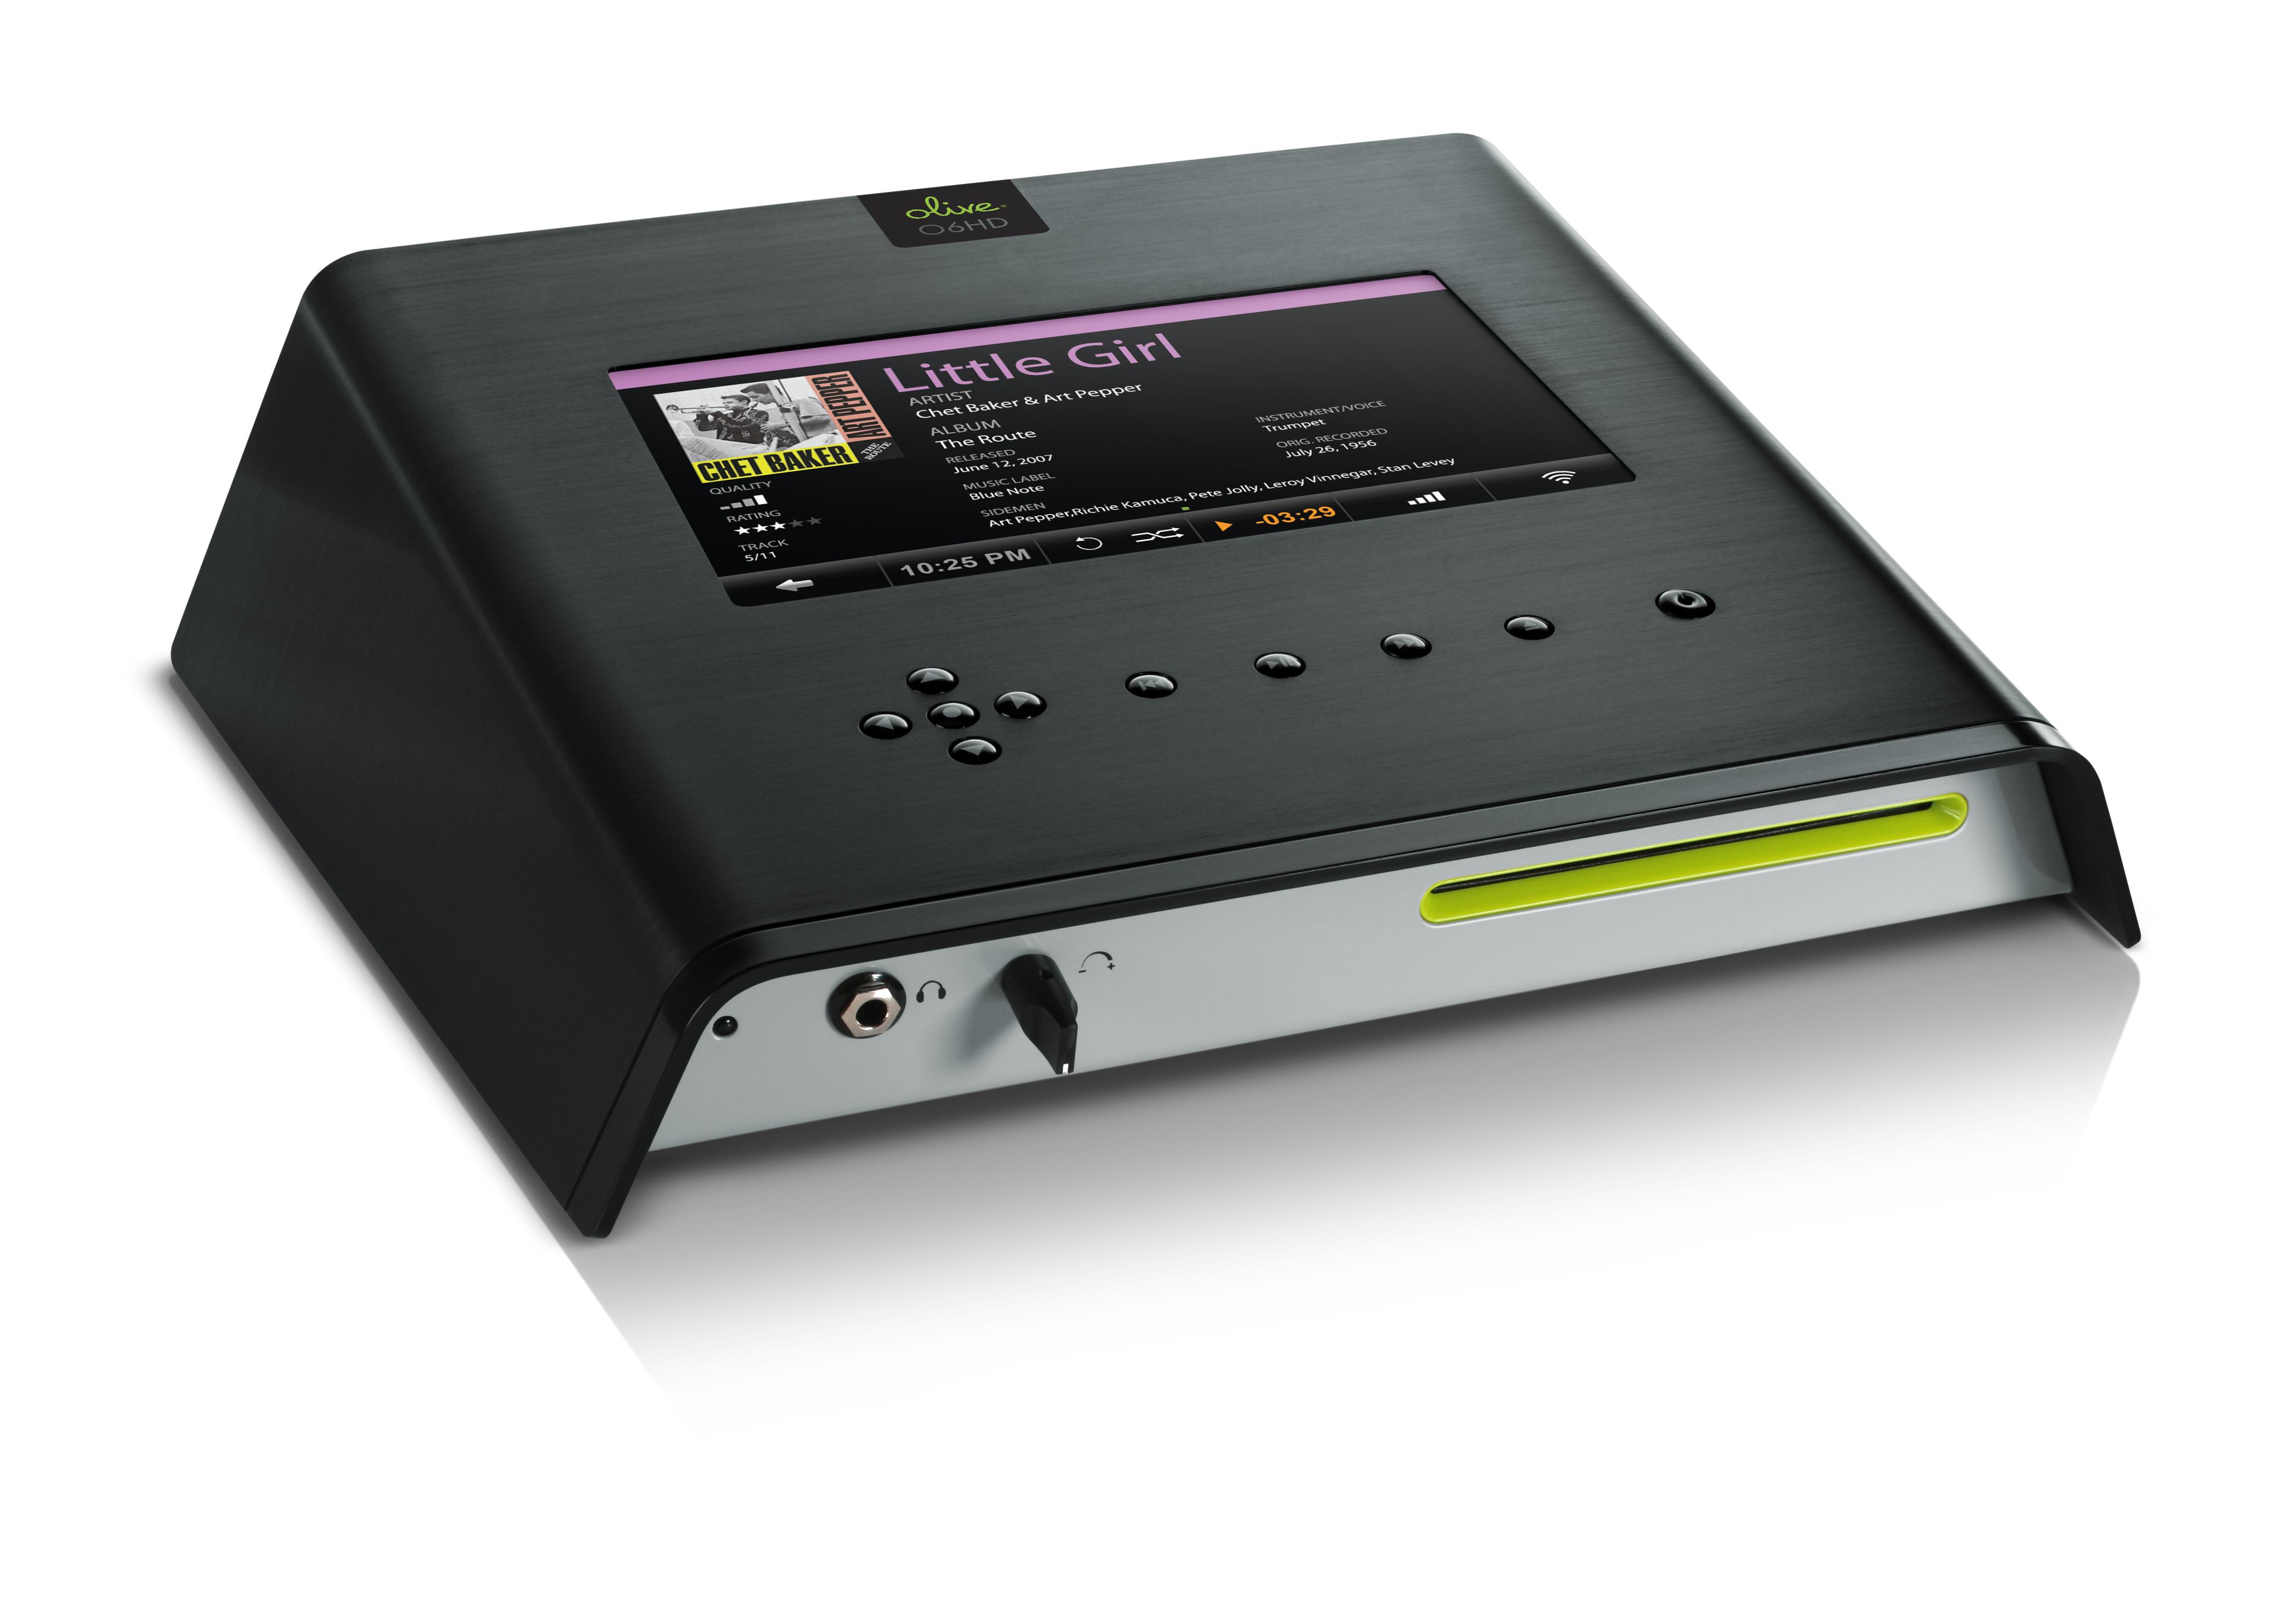 Olive 06HD - Ein audiophiler Musikserver mit elegantem Design